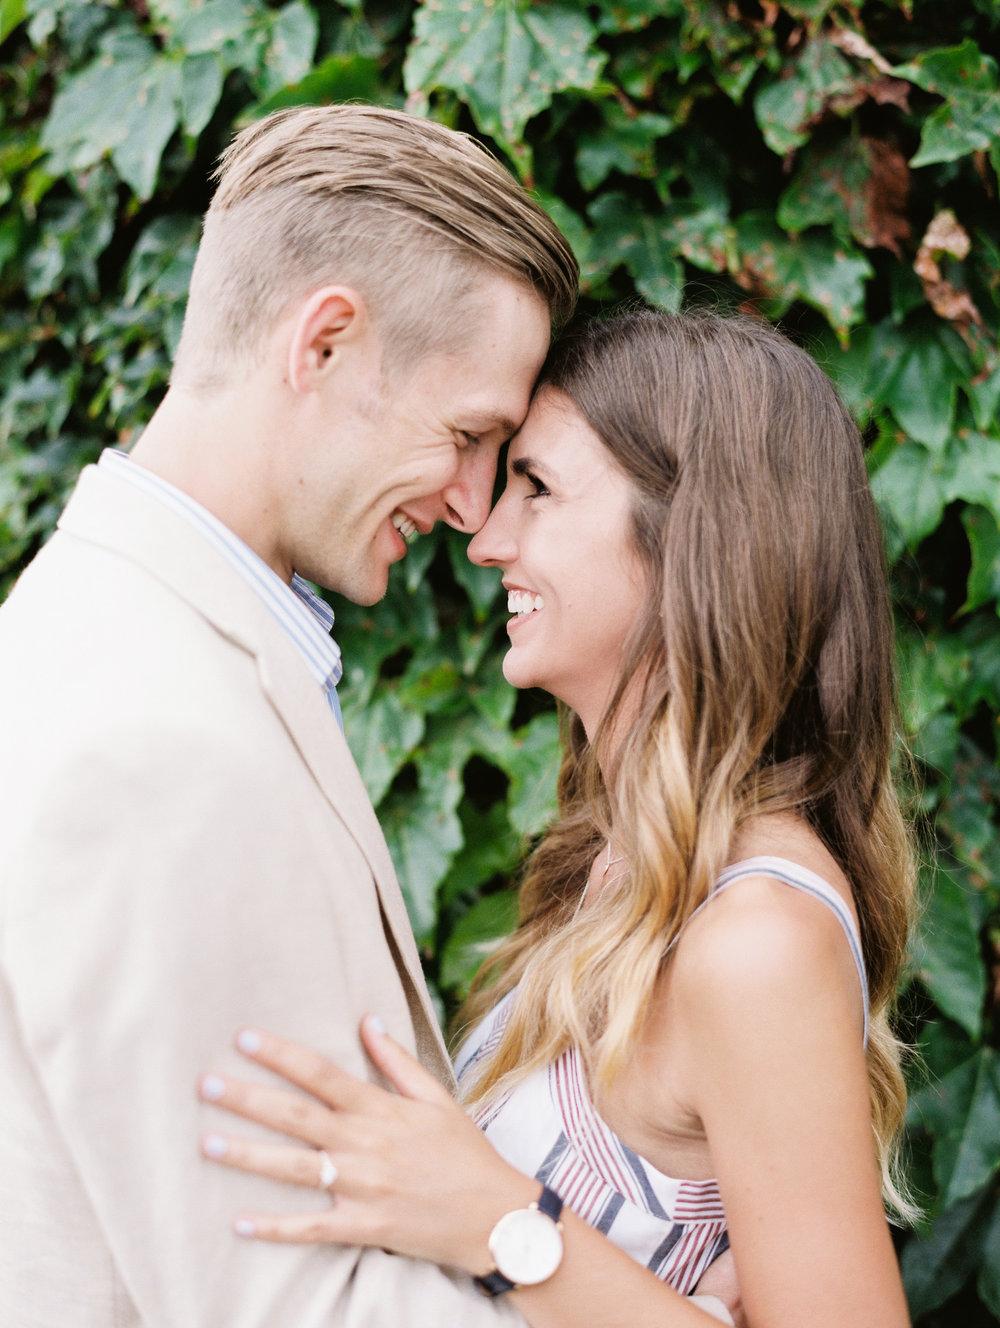 Kerri+Austin+Lavender+Field+Engagement-19.jpg